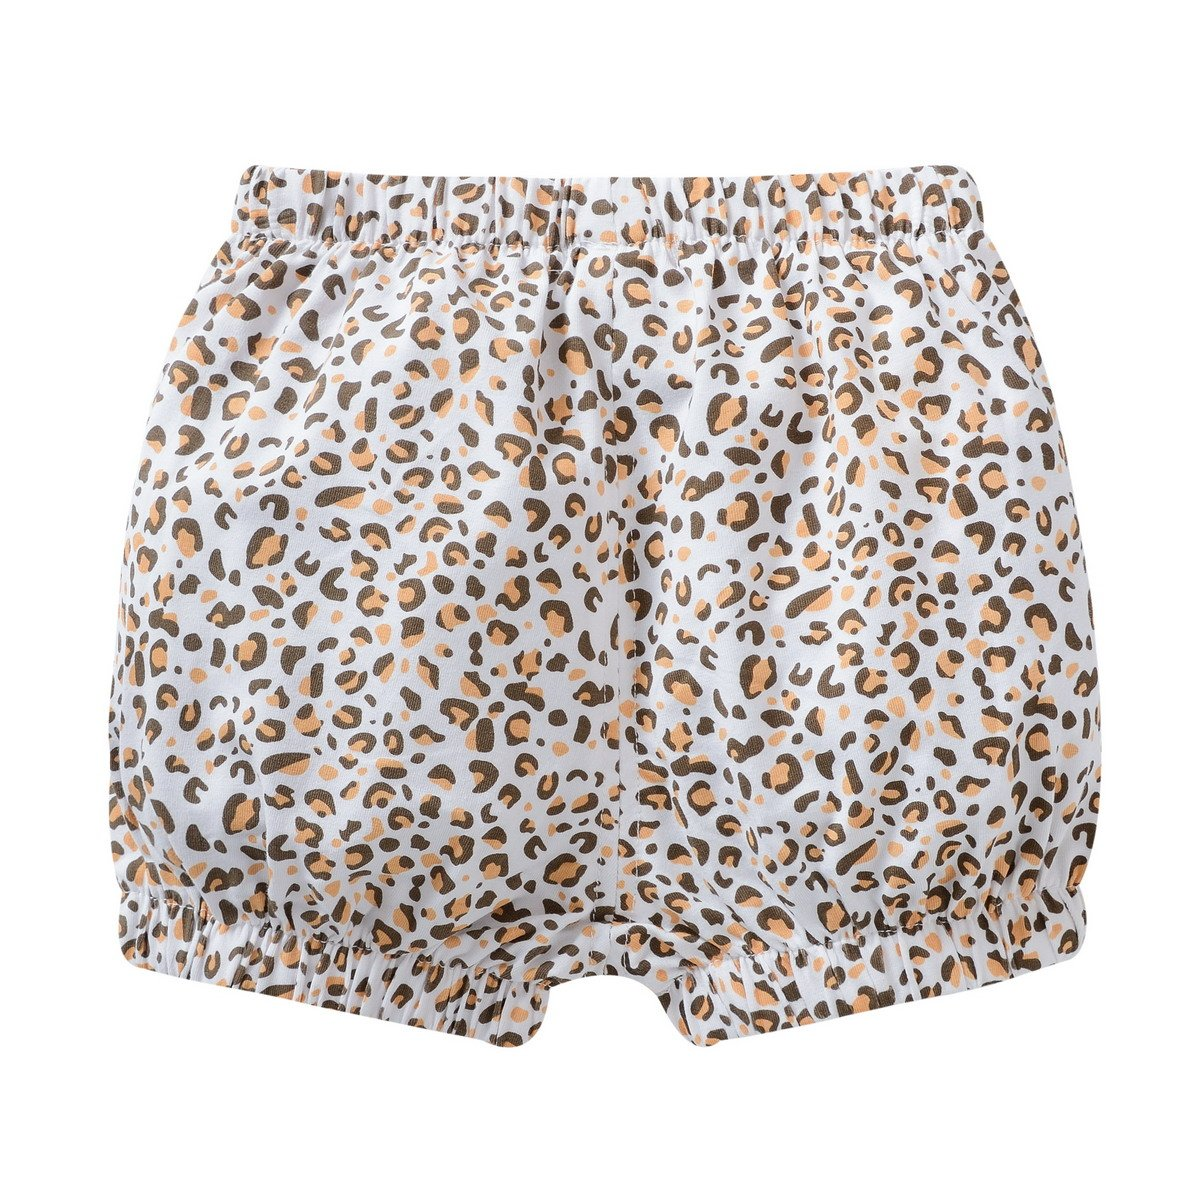 Wuawua Children Girl Shorts Leopard Grain Sweet Cotton Baby Bloomers Pant Size 12M-3T